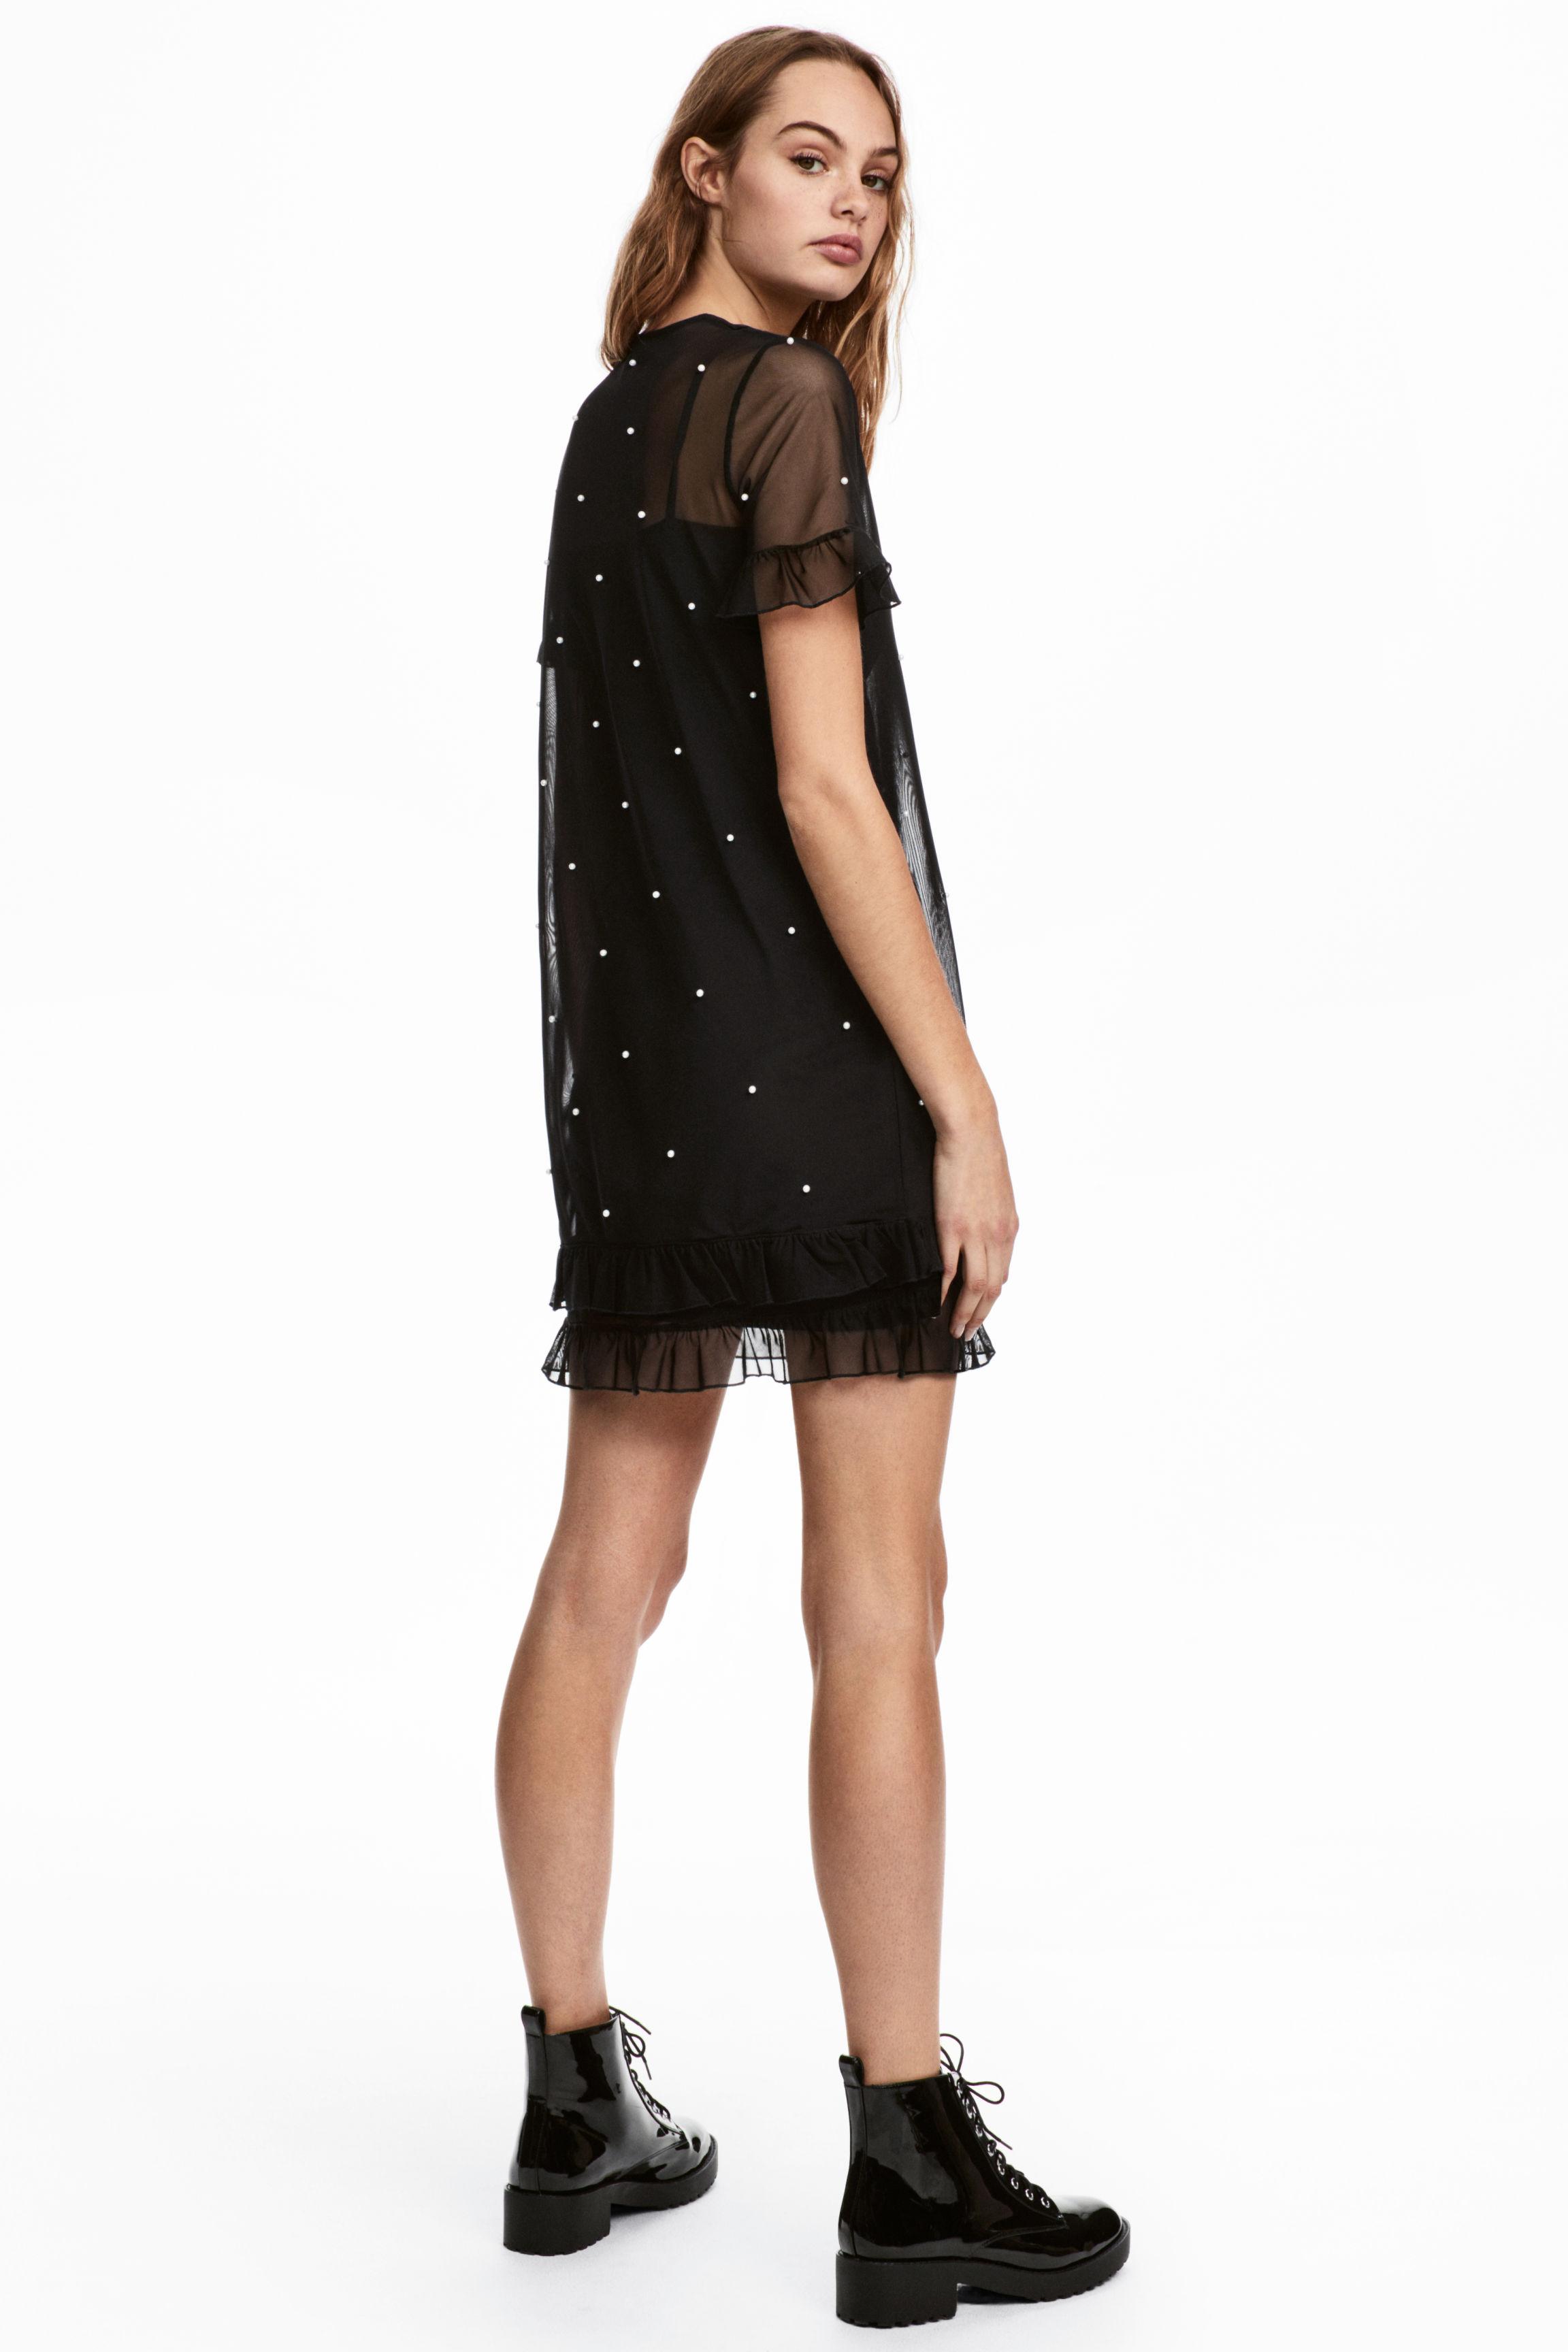 416c3d47ddbd H & M Beads With Mesh Black Dress - We Select Dresses